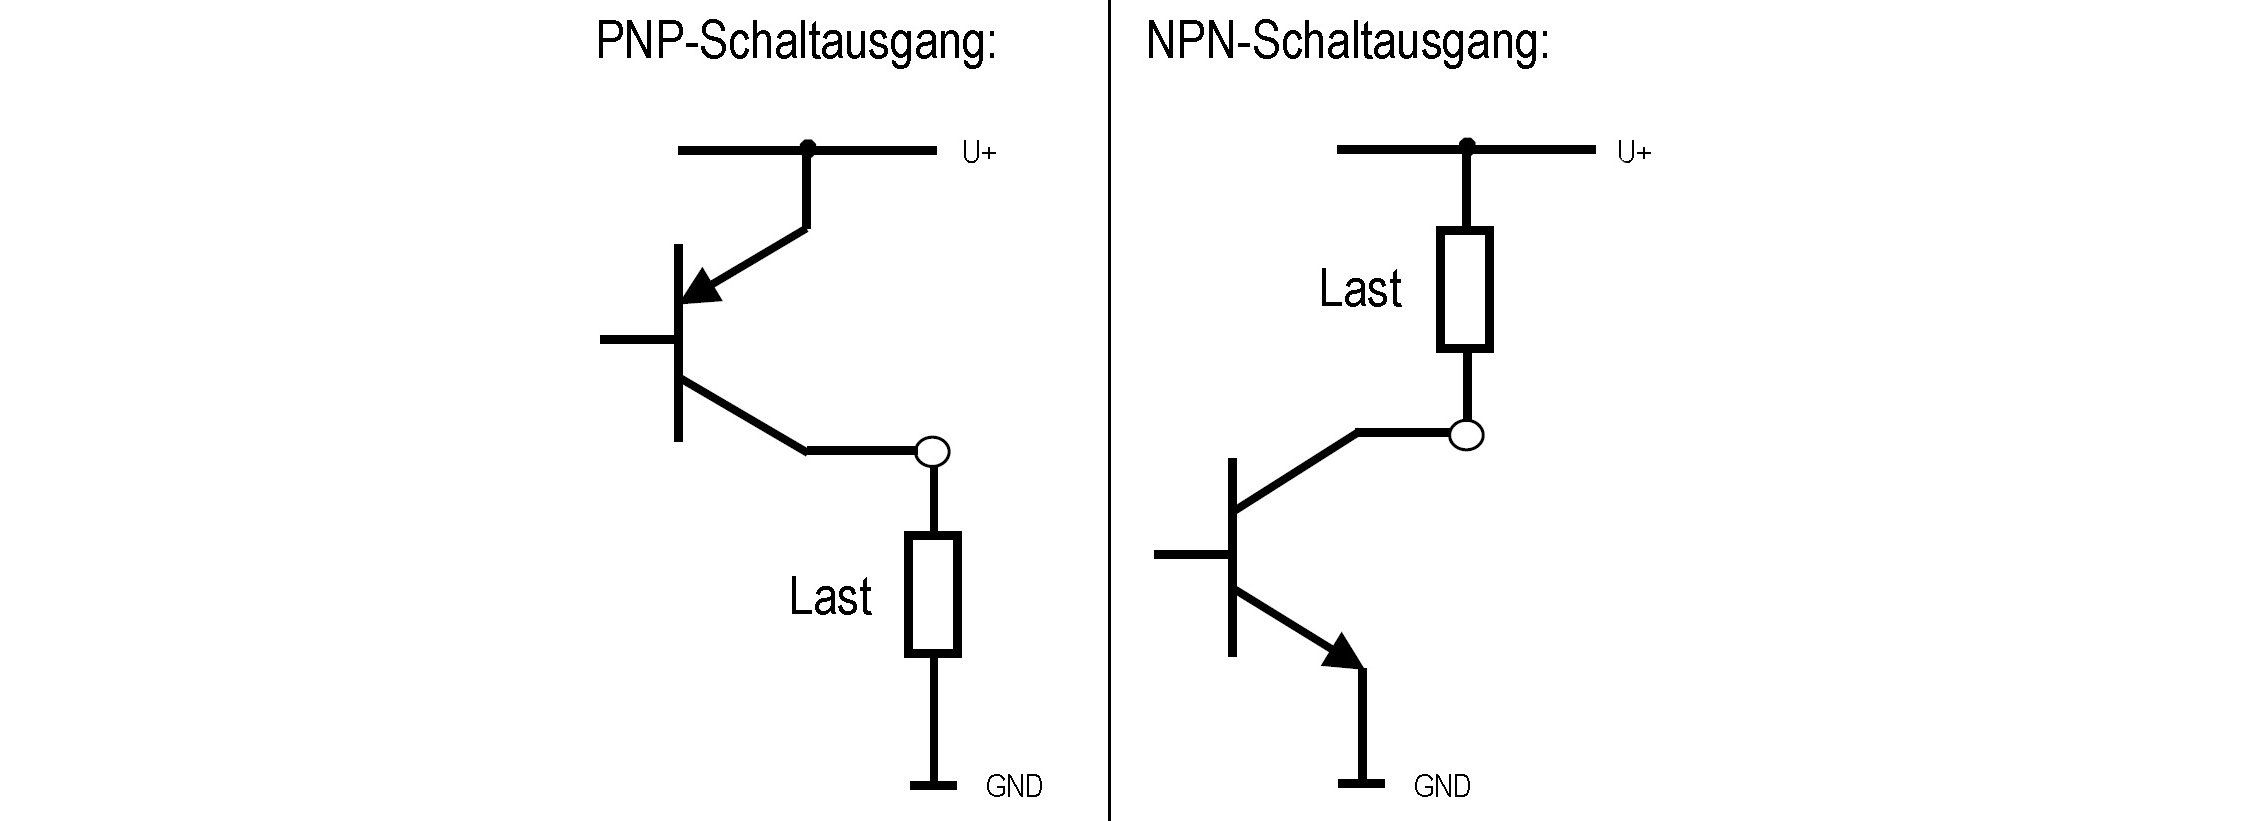 Anschluss Pnp Und Npn Transistorschaltausgang Bei